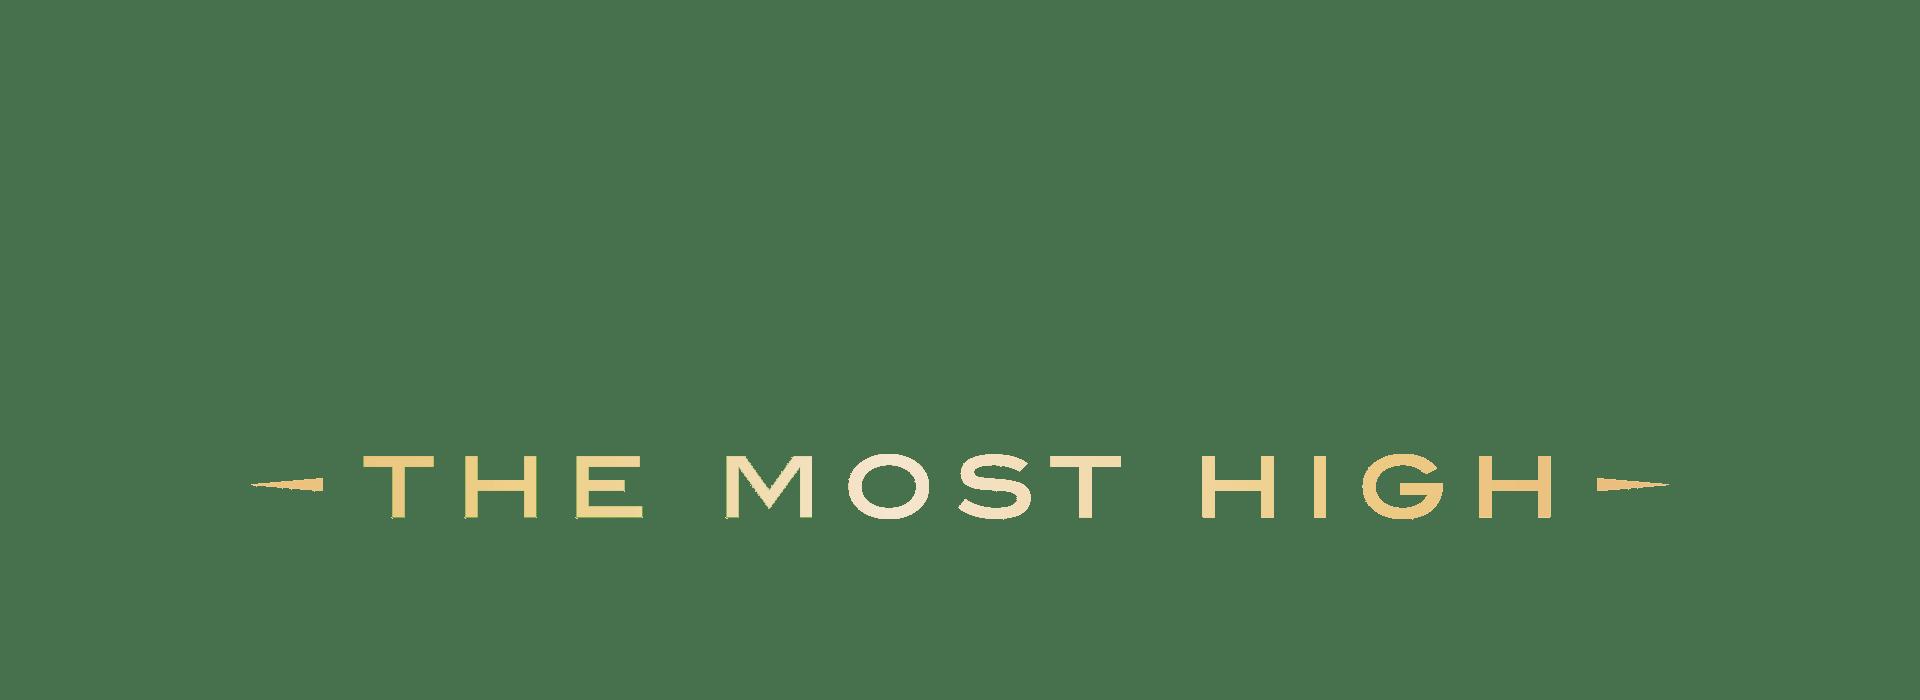 The Most High - Elyon Cannabis